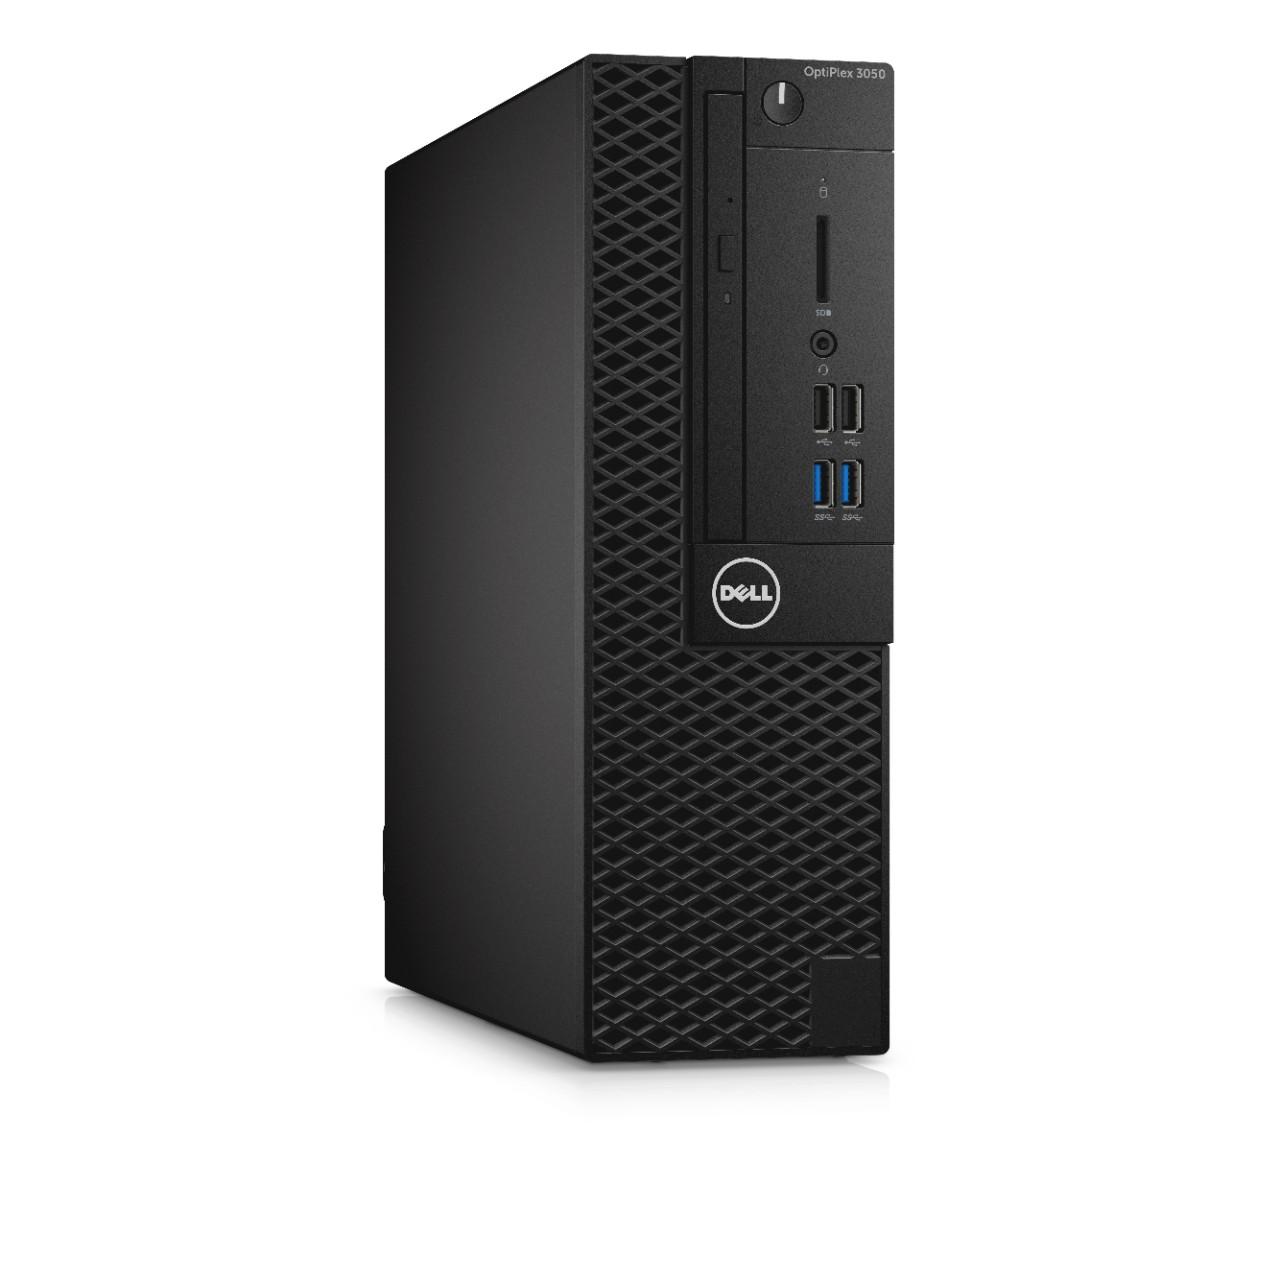 Dell PC Optiplex 3050 SF i3-7100/8G/256GB SSD/DP/HDMI/DVD RW/W10P/3RNBD/Černý